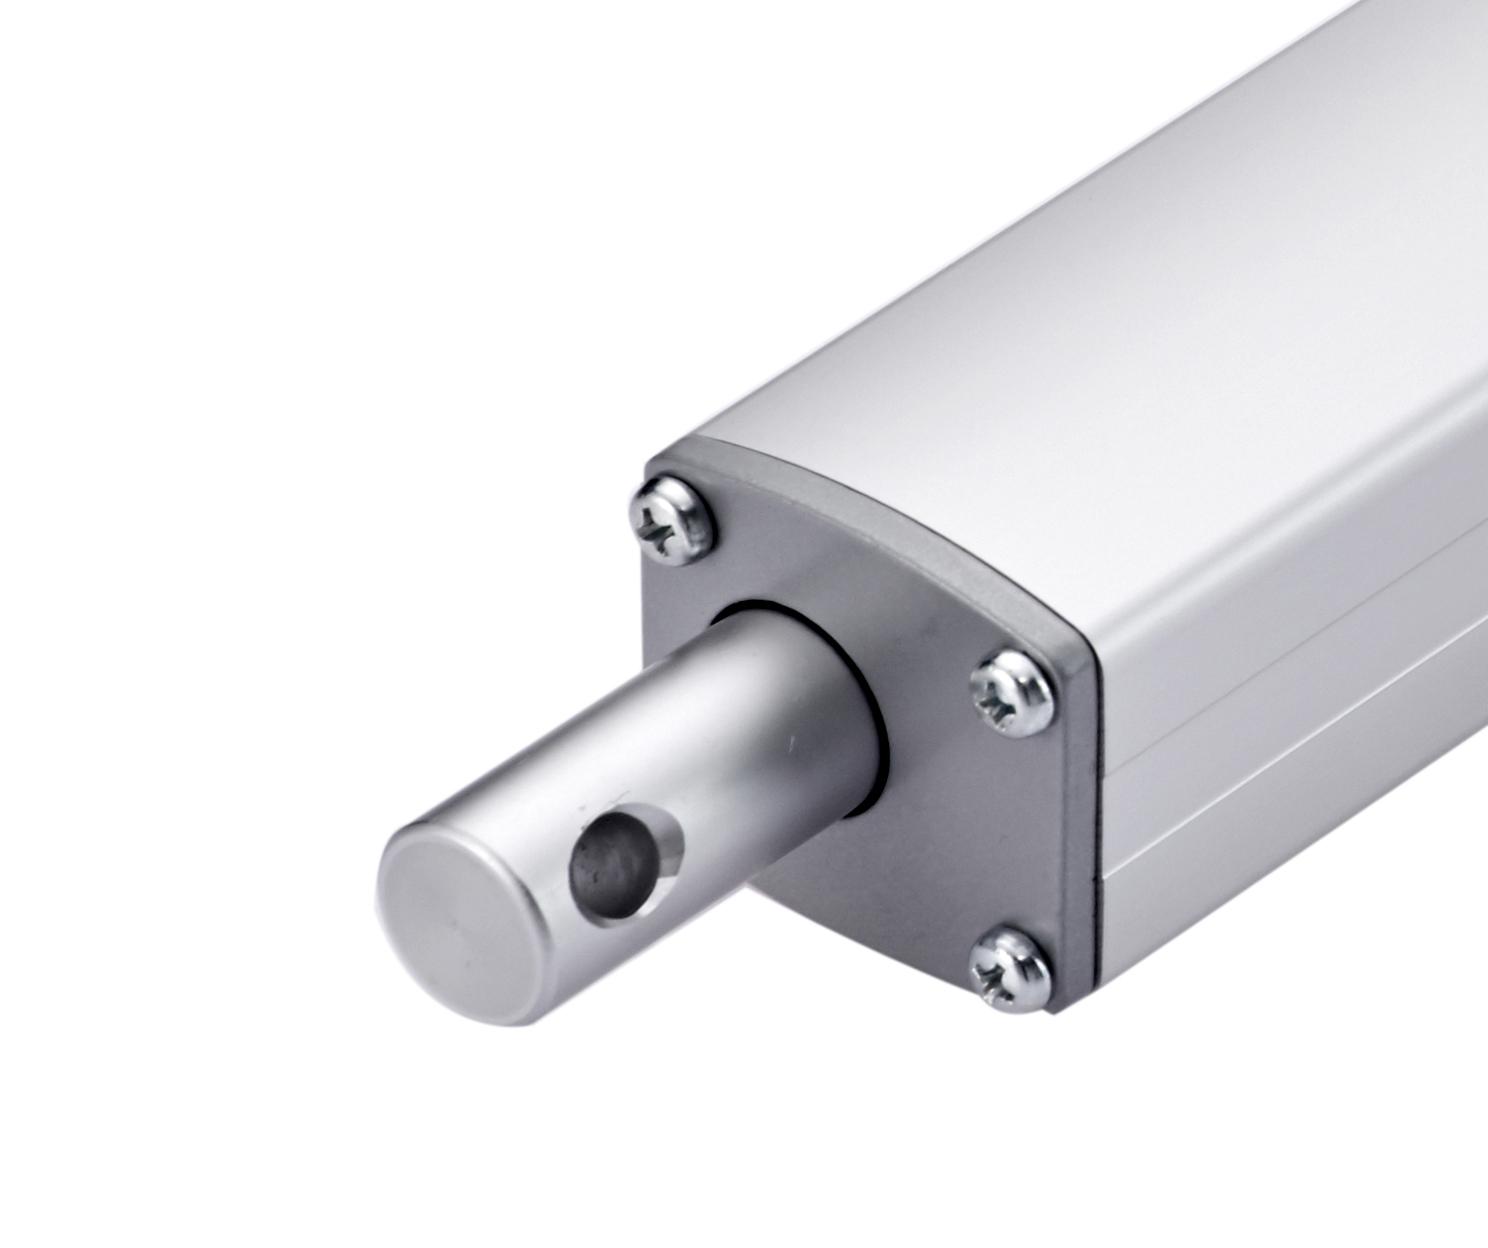 KST-A01 linear actuator - 3